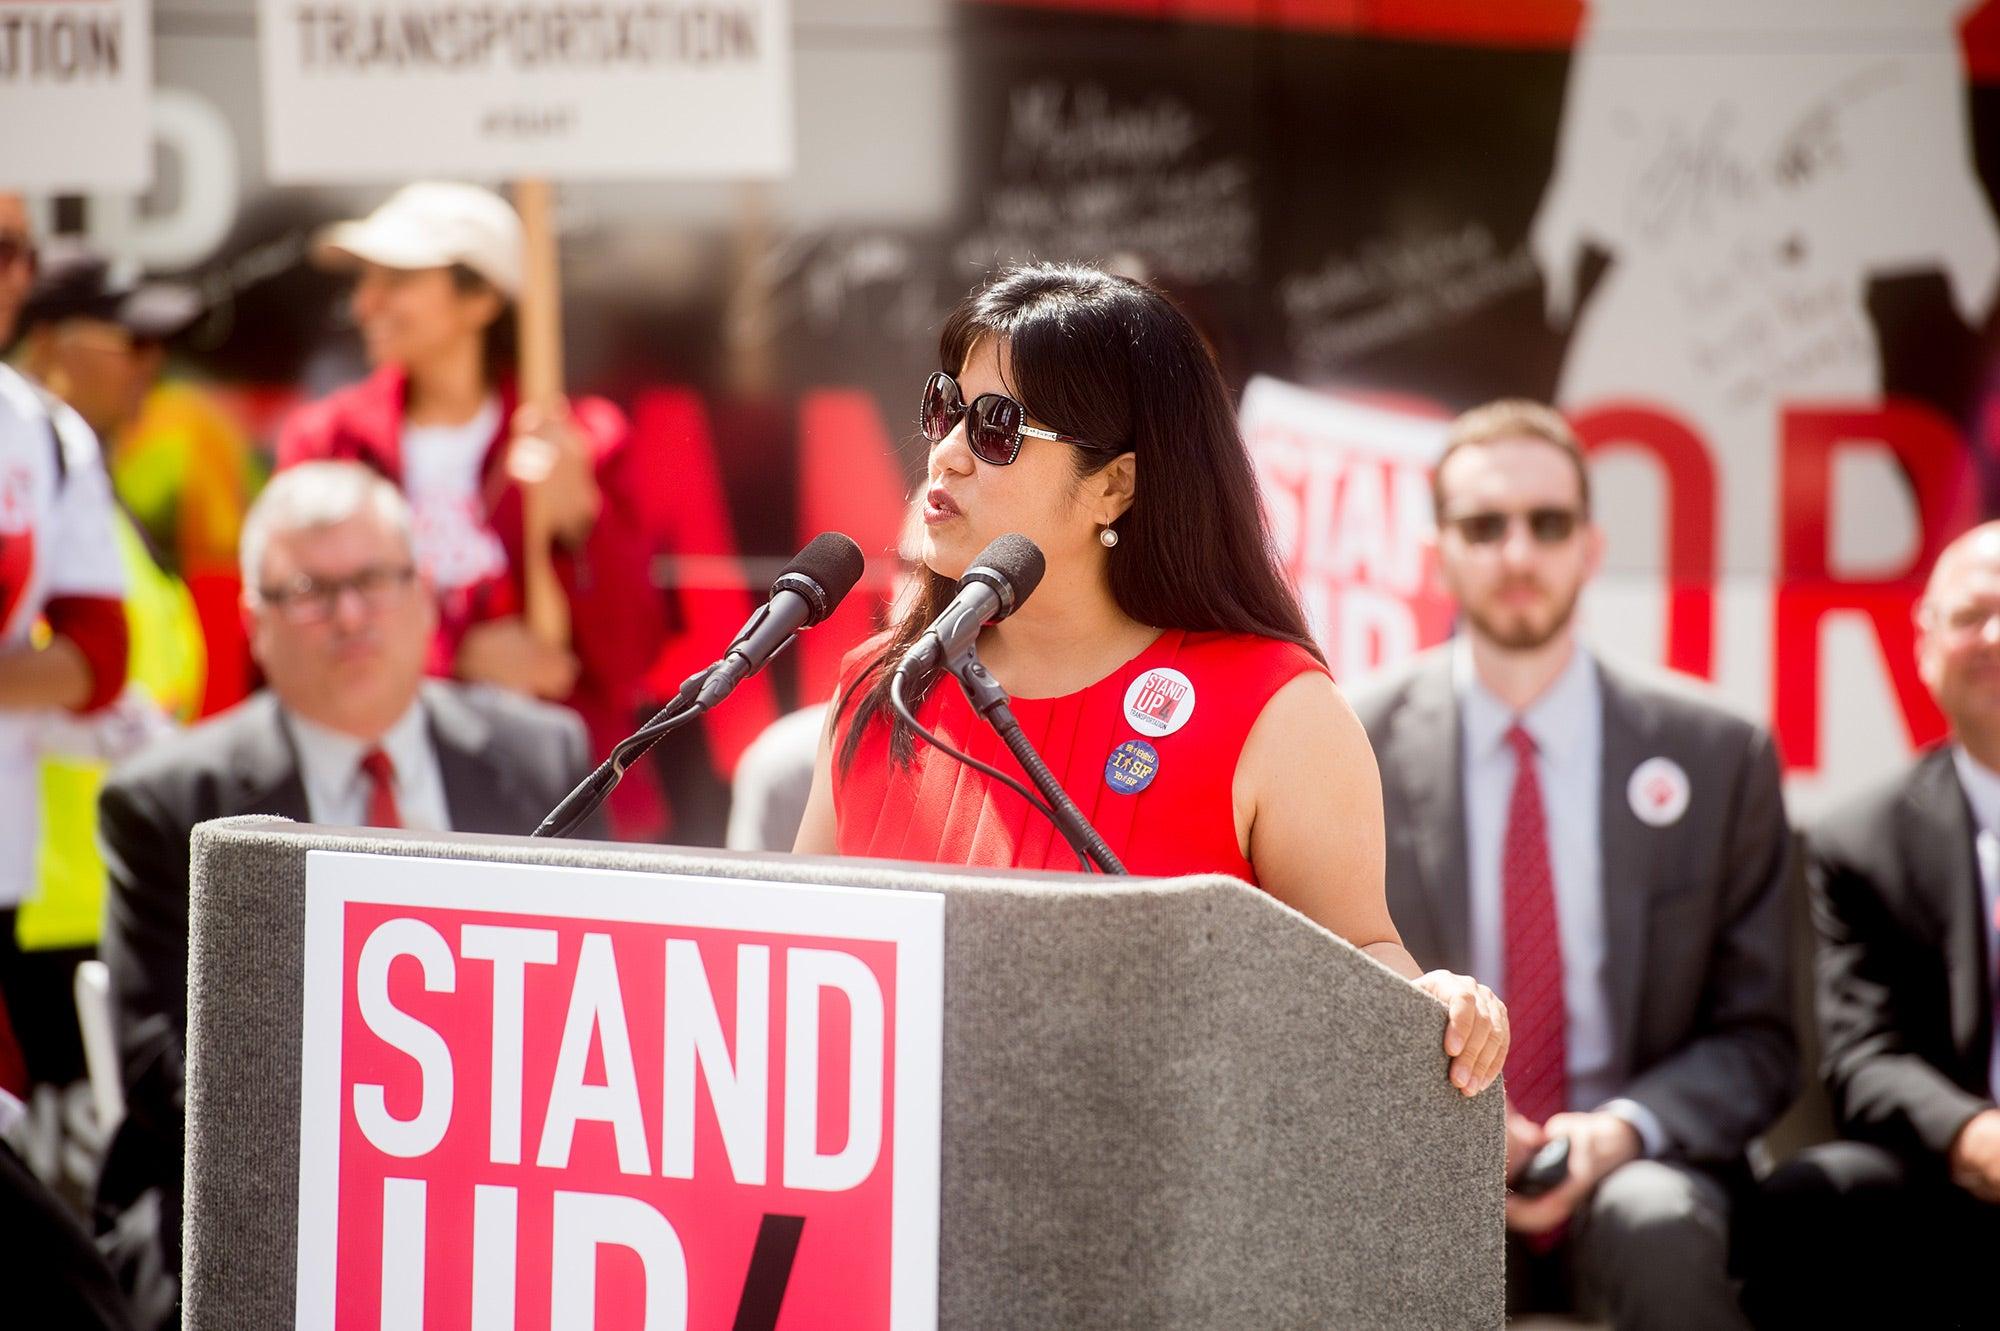 Tilly Chang, executive director, San Francisco County Transportation Authority